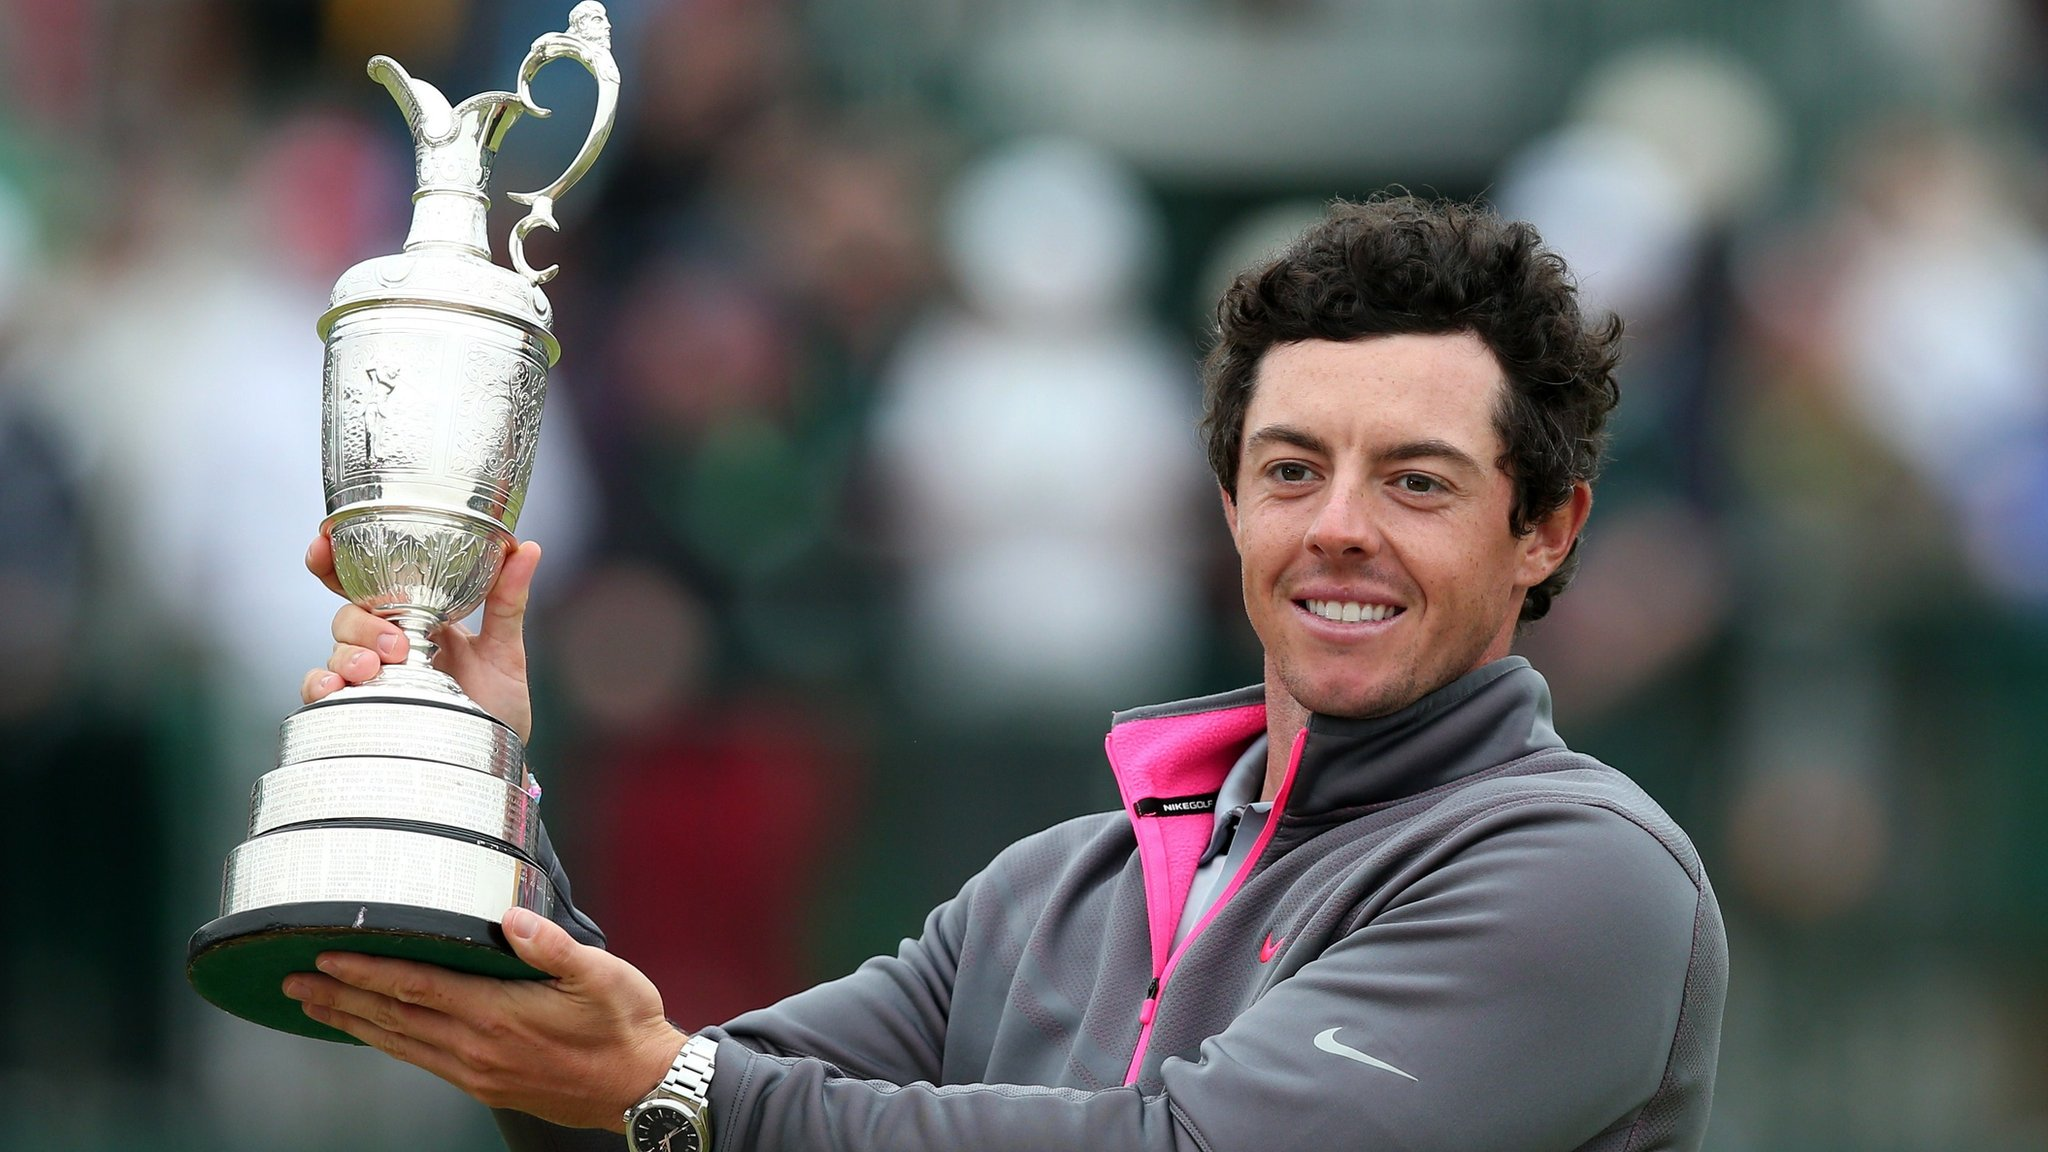 rory mcilroy wins golf open championship